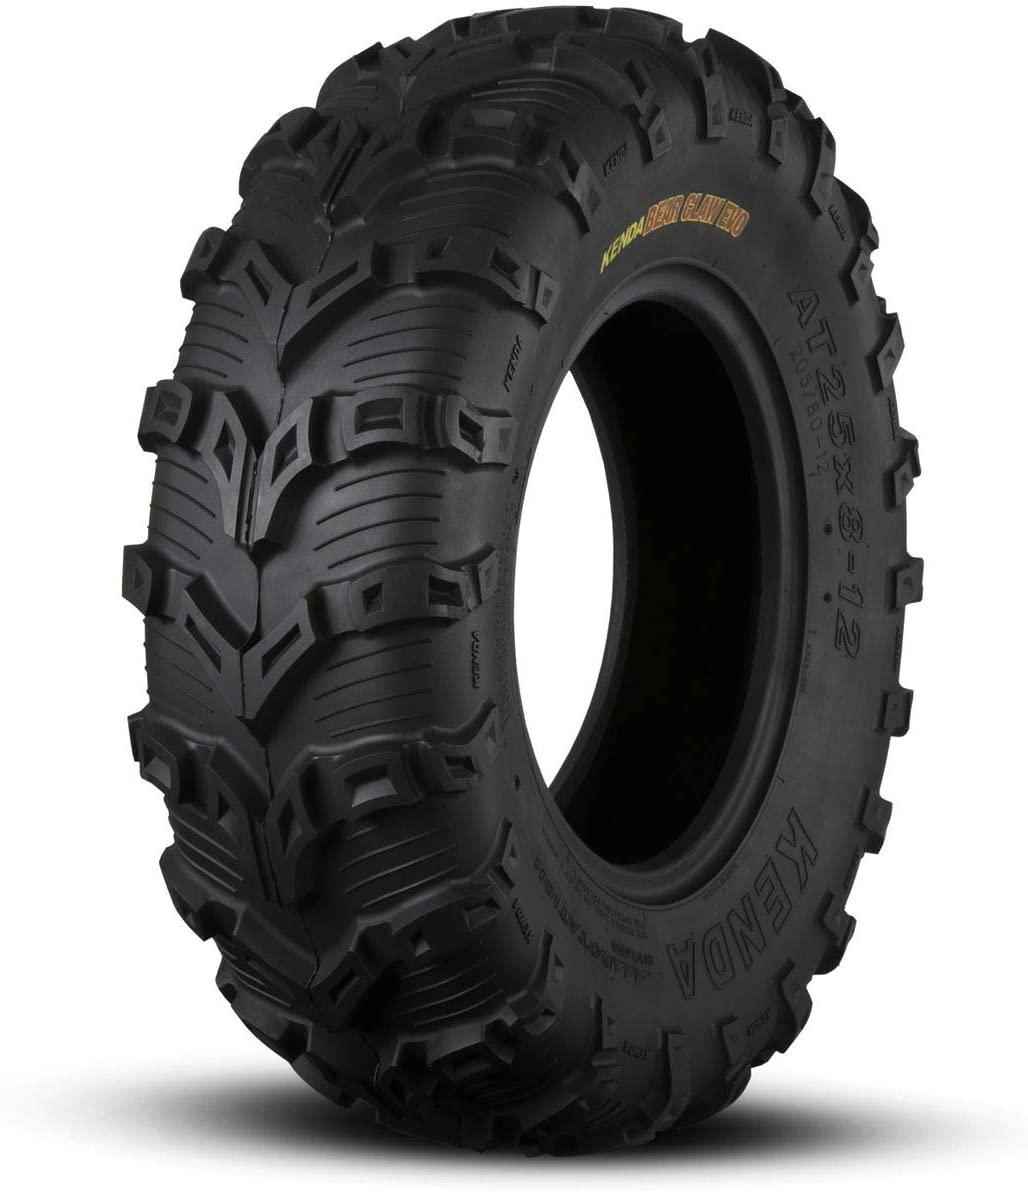 Kenda K592 Bear Claw EVO ATV Bias Tire - 26x9.00-14